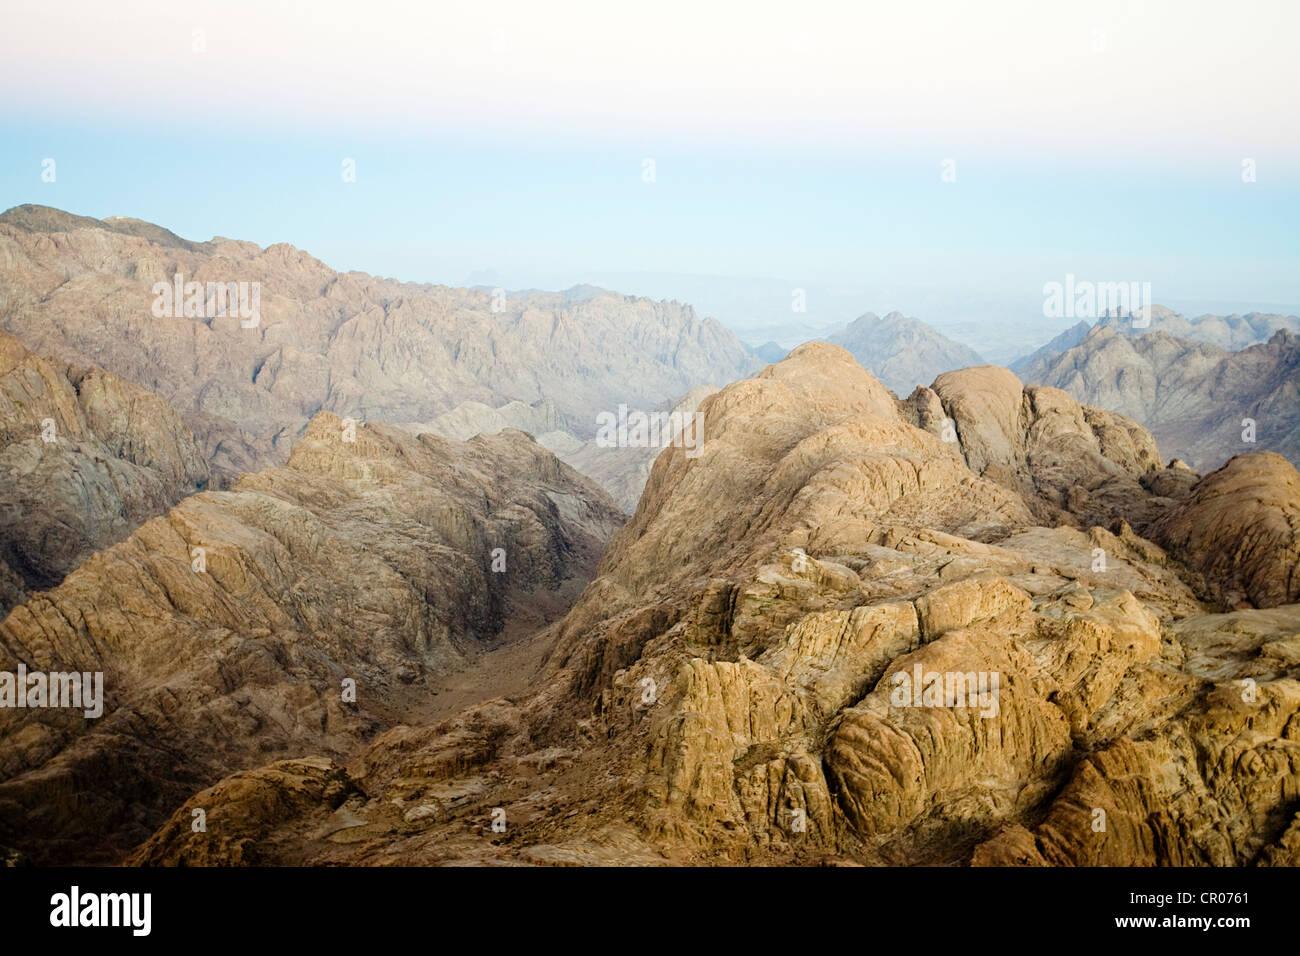 Egypt, Sinai Peninsula, Mount Sinai at sunrise, site listed as World Heritage by the UNESCO - Stock Image